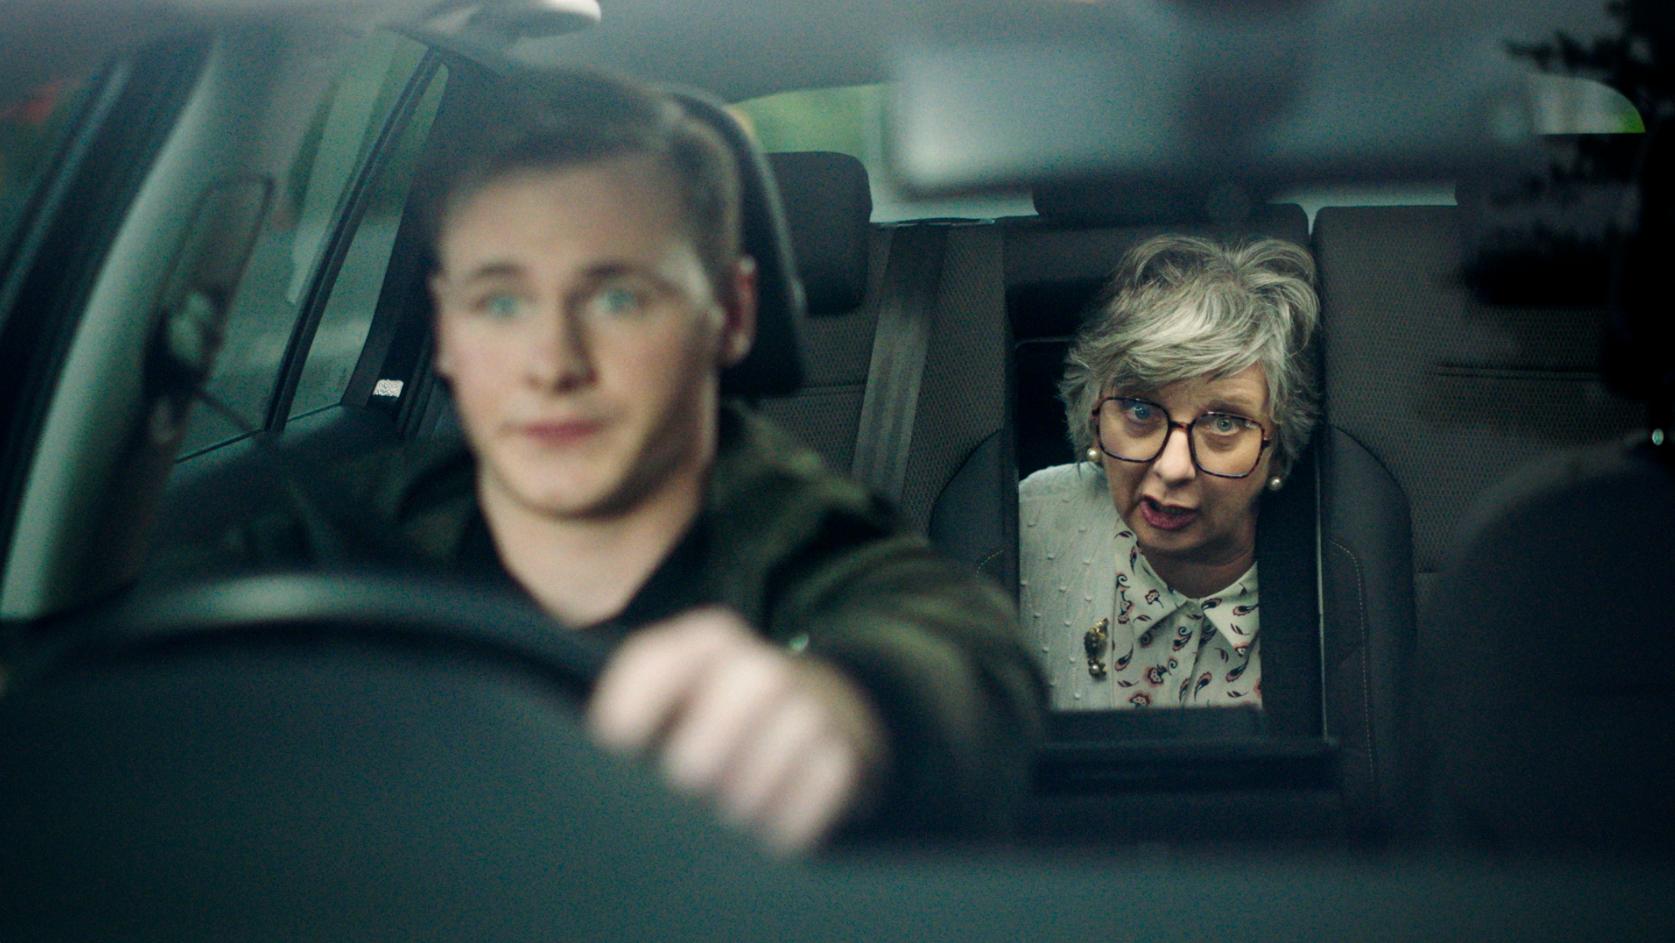 Drive like Gran's in the car